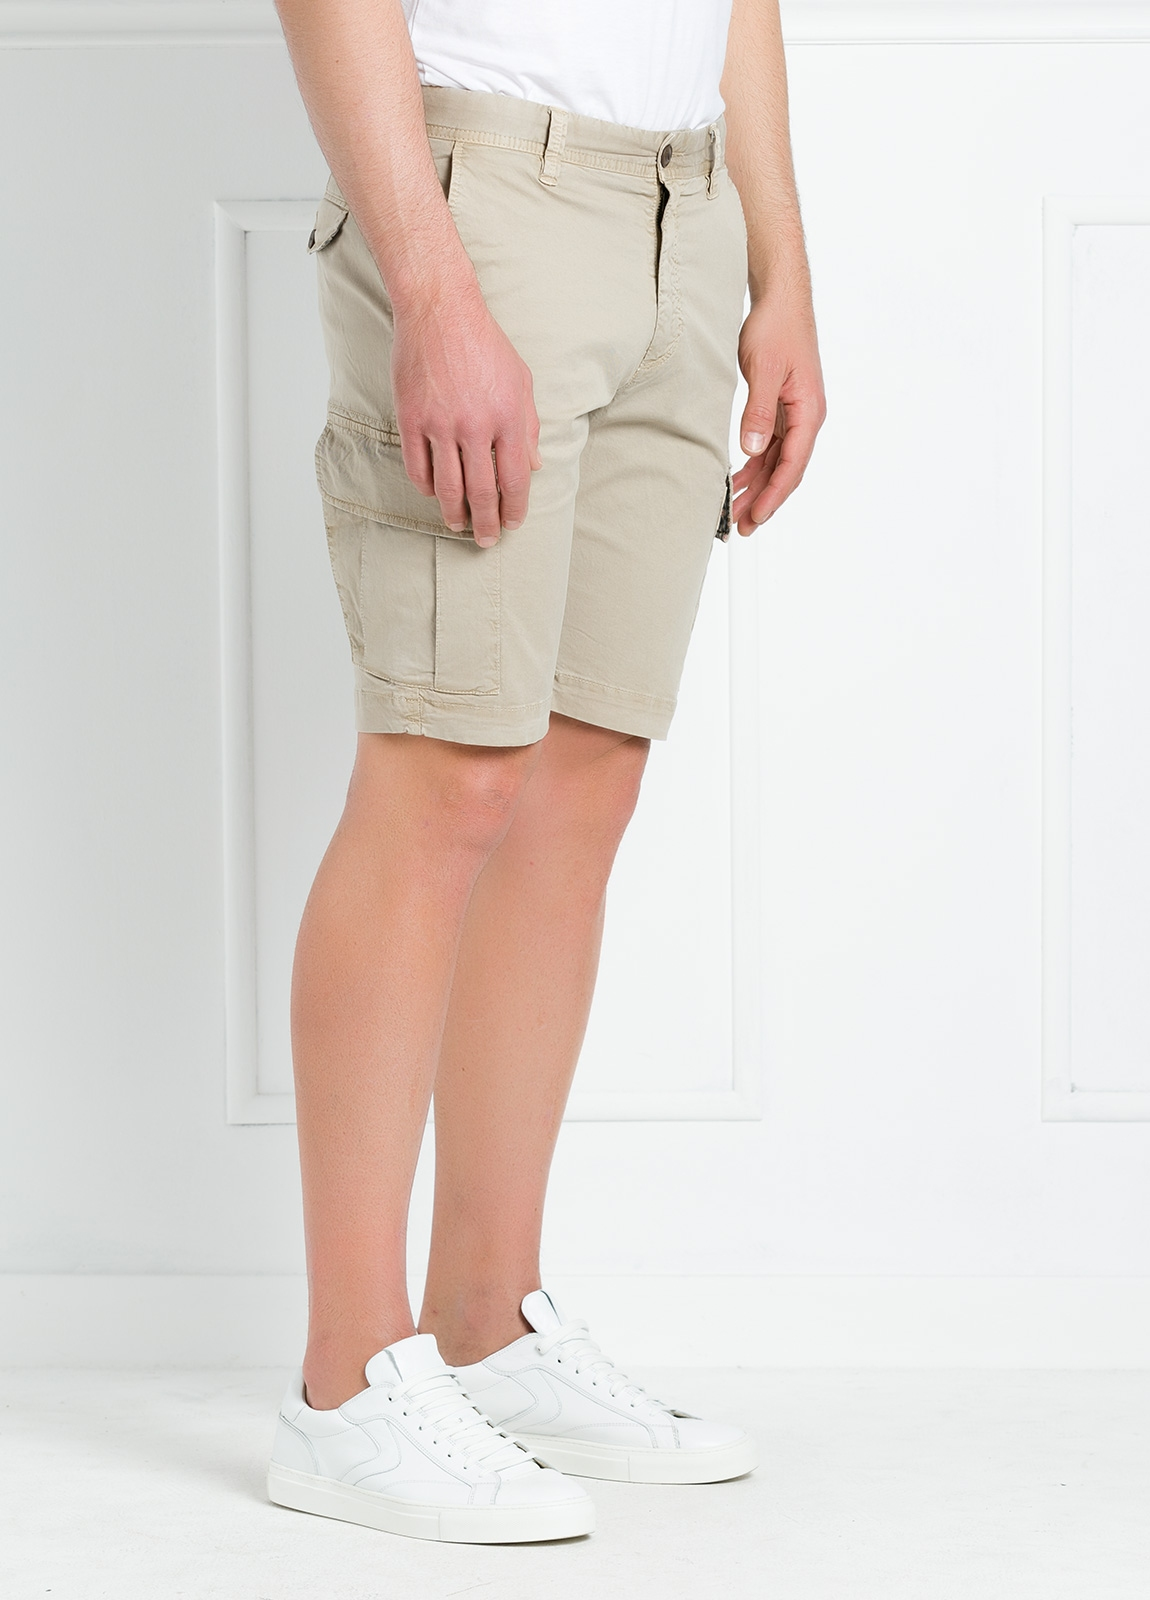 Bermuda modelo BILL 334 slim fit con bolsillos laterales. Color beige. - Ítem3